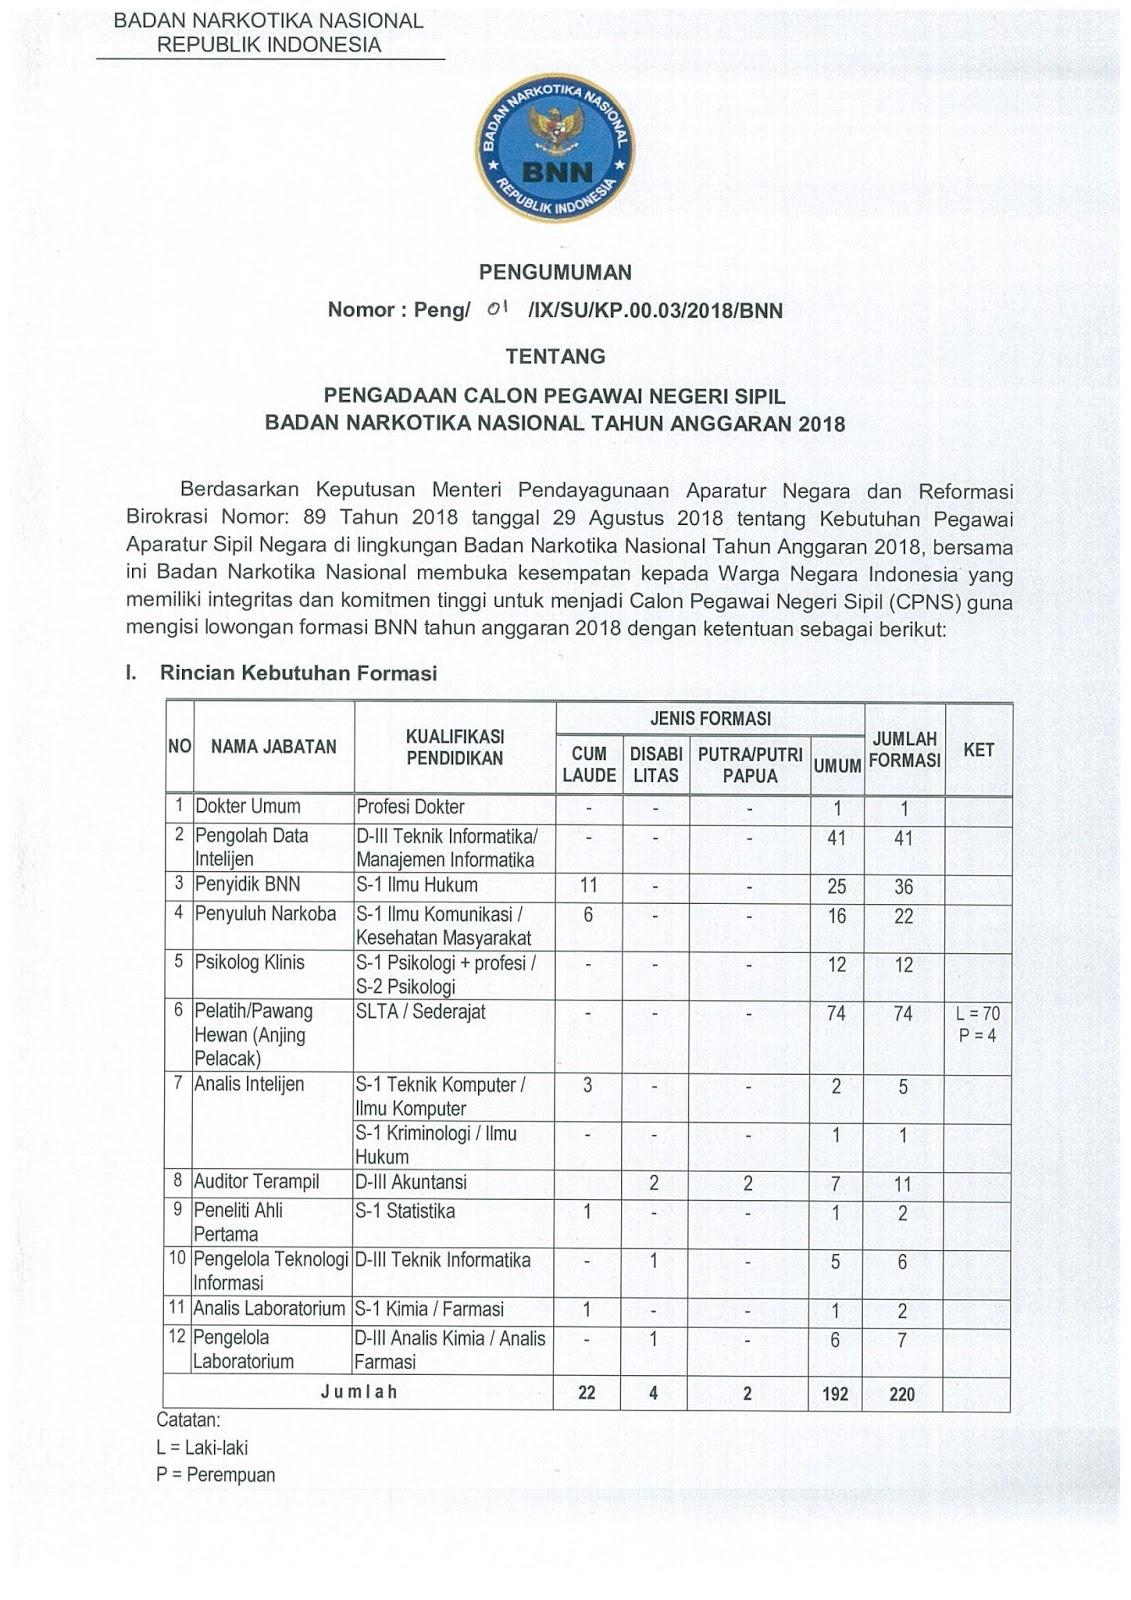 Formasi CPNS 2019 untuk lulusan slta (sma / ma / smk) sederajat...